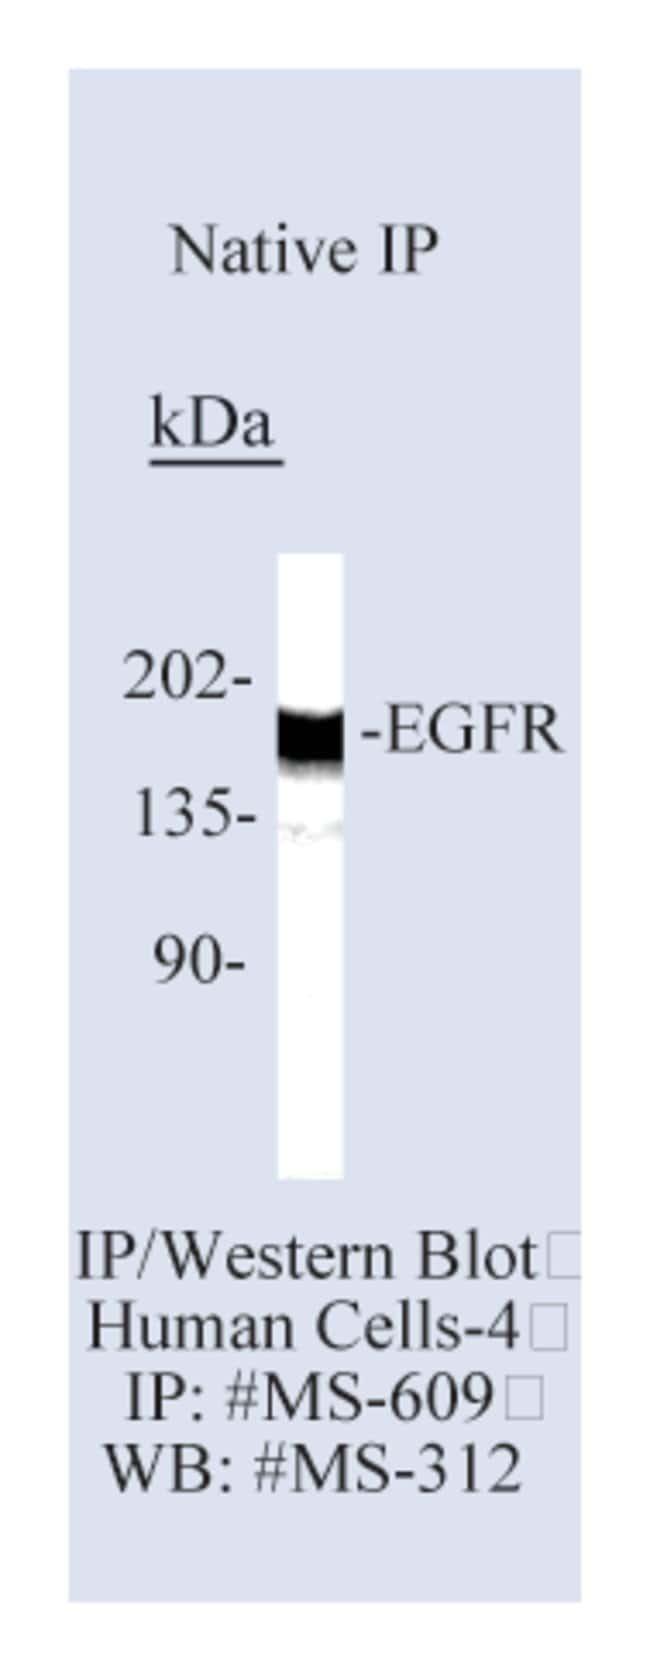 Epredia™Lab Vision™ Epidermal Growth Factor Receptor/EGFR Ab-13 Mouse Monoclonal Antibody 500μL; 200μg/mL; Biotin labeled with BSA and azide Epredia™Lab Vision™ Epidermal Growth Factor Receptor/EGFR Ab-13 Mouse Monoclonal Antibody